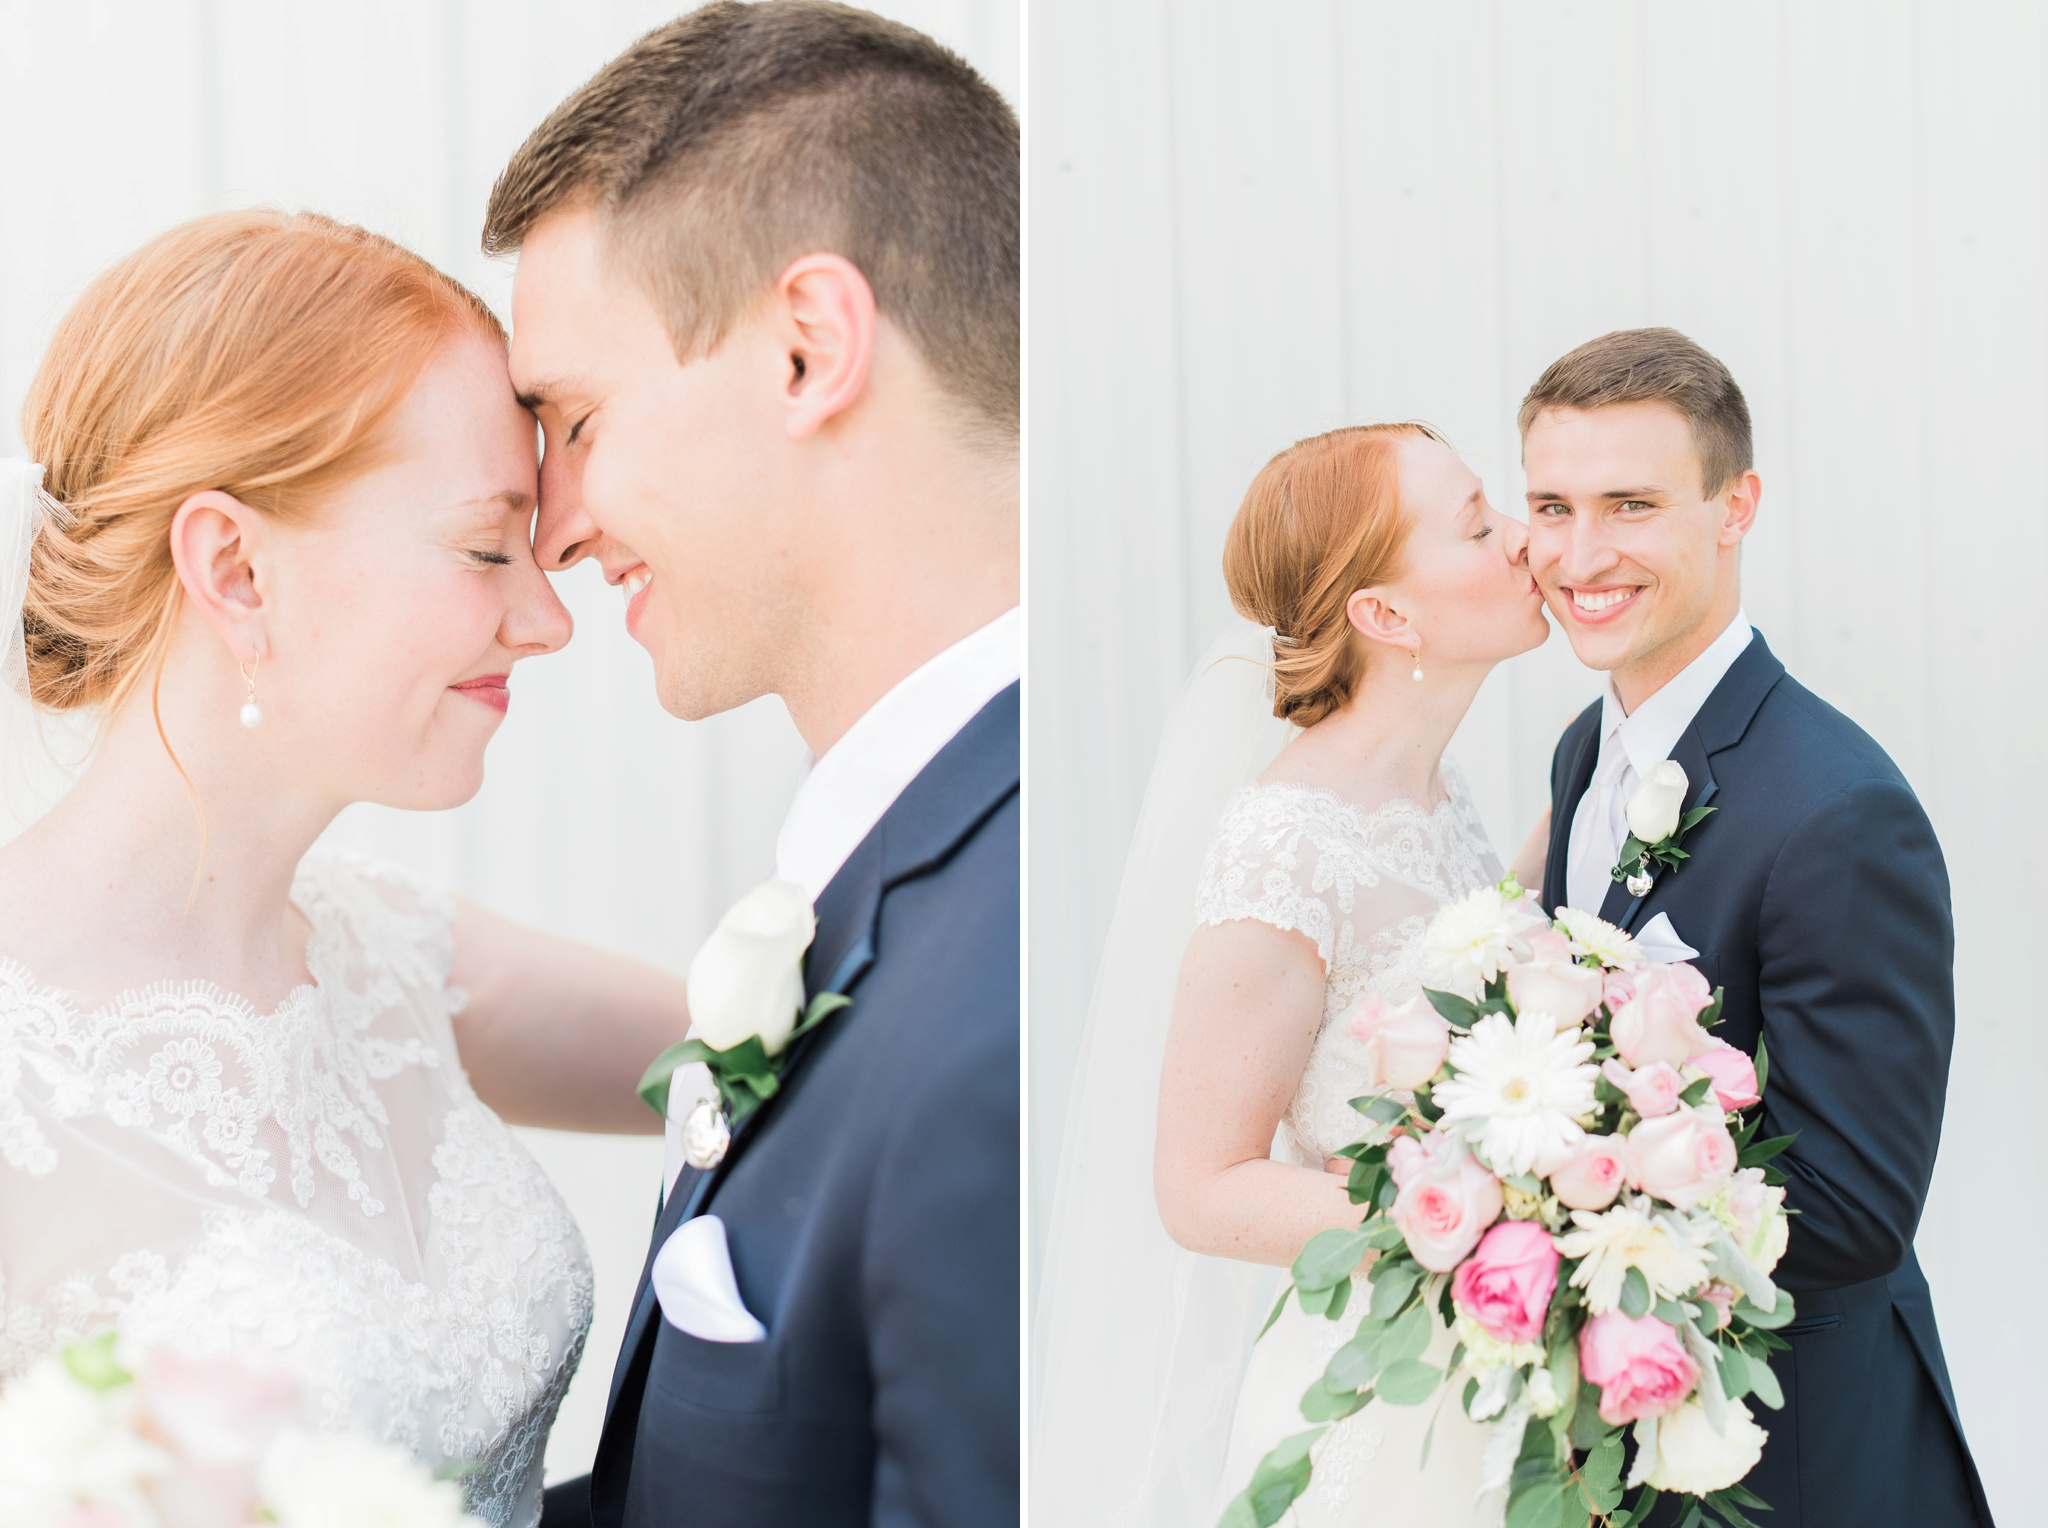 sunbury-ohio-wedding-hannah-johnathan_0100.jpg